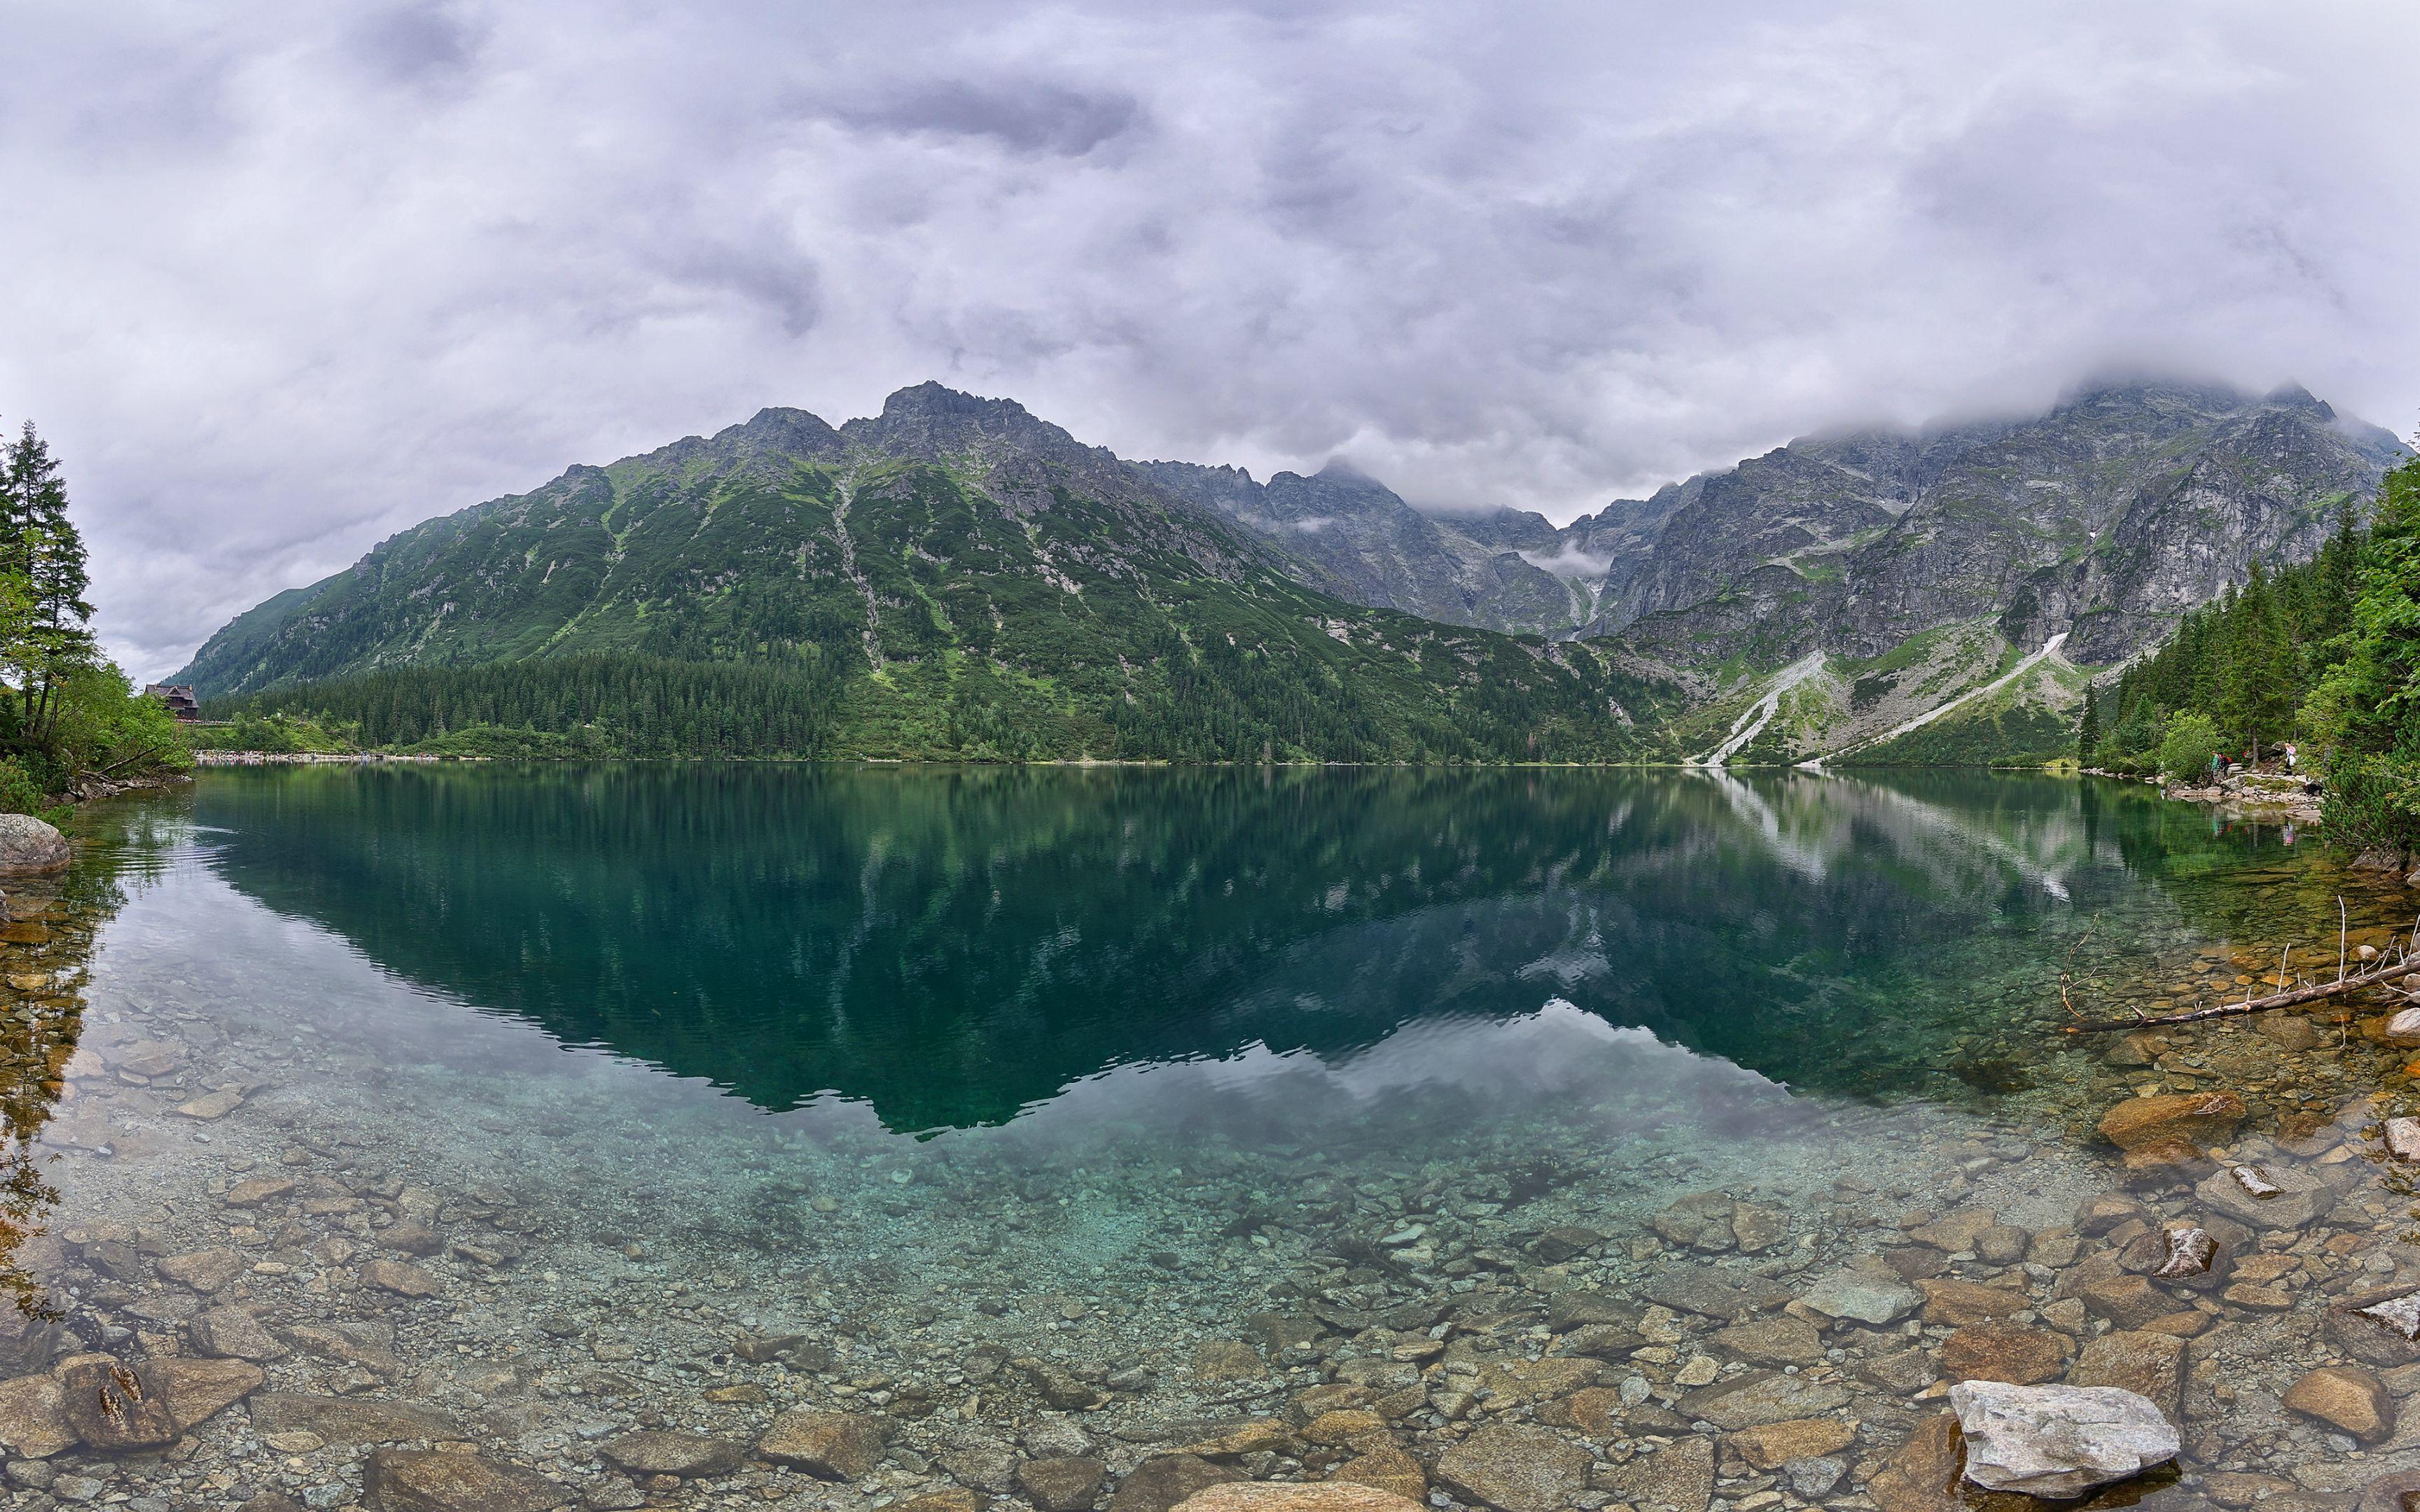 Panoramic Wallpaper Windows 7 3456x2160 Nature Wallpaper Mountain Landscape Mountain Background